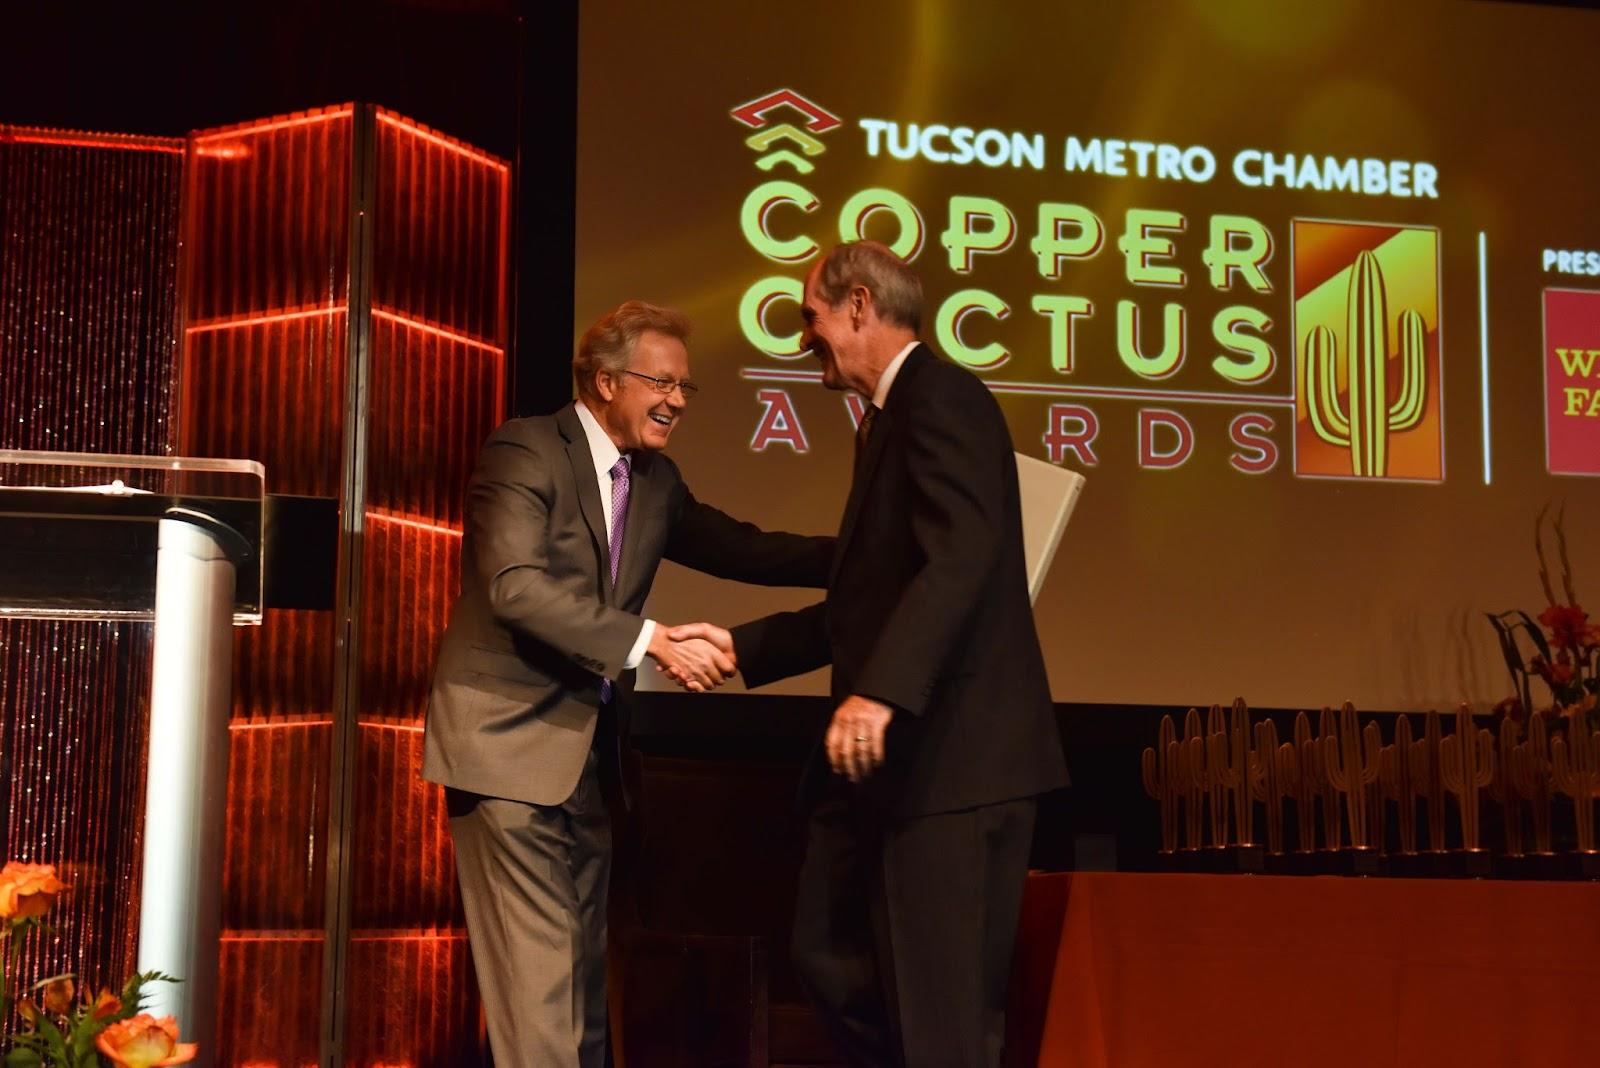 Copper Cactus 2015 - 150911-Chamber-CopperCactus-0299.jpg